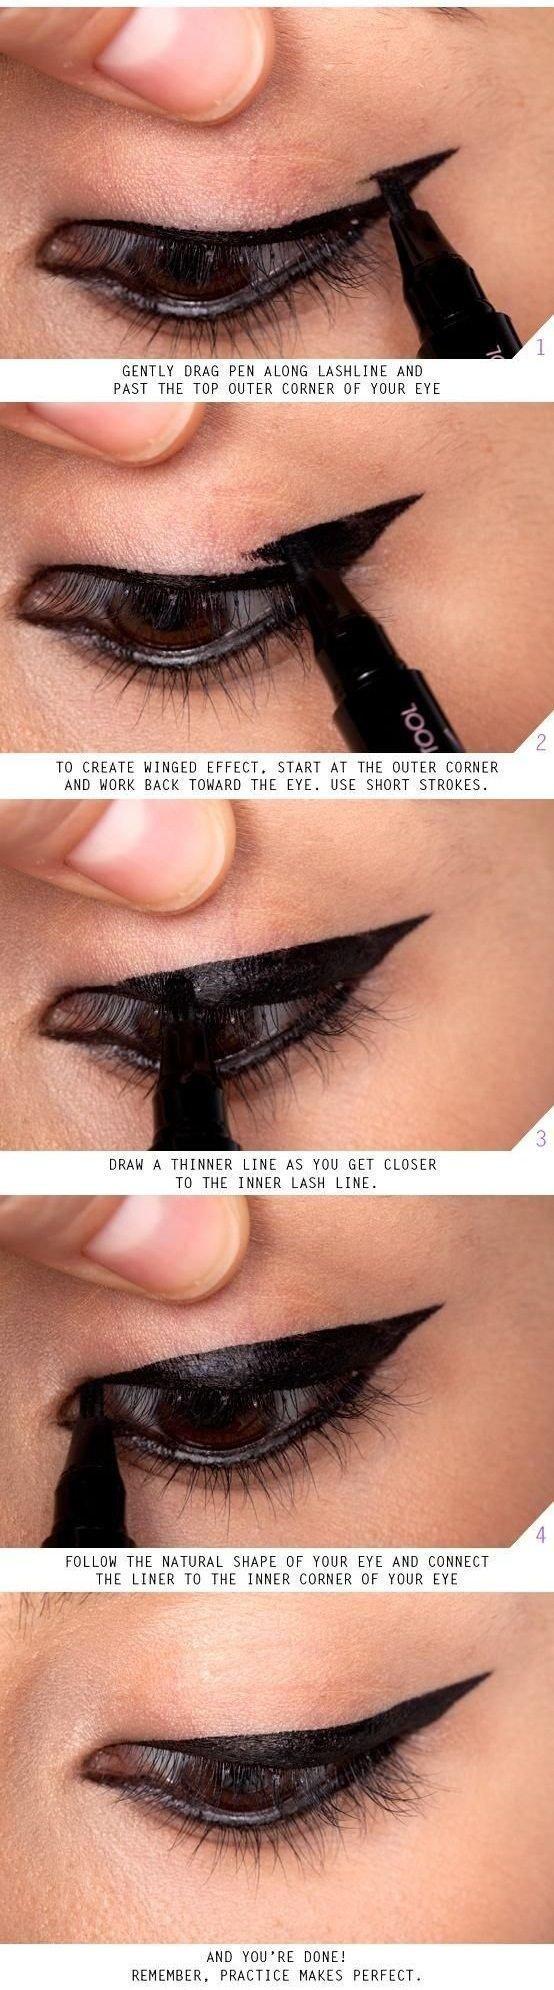 face,eyebrow,cheek,lip,beauty,